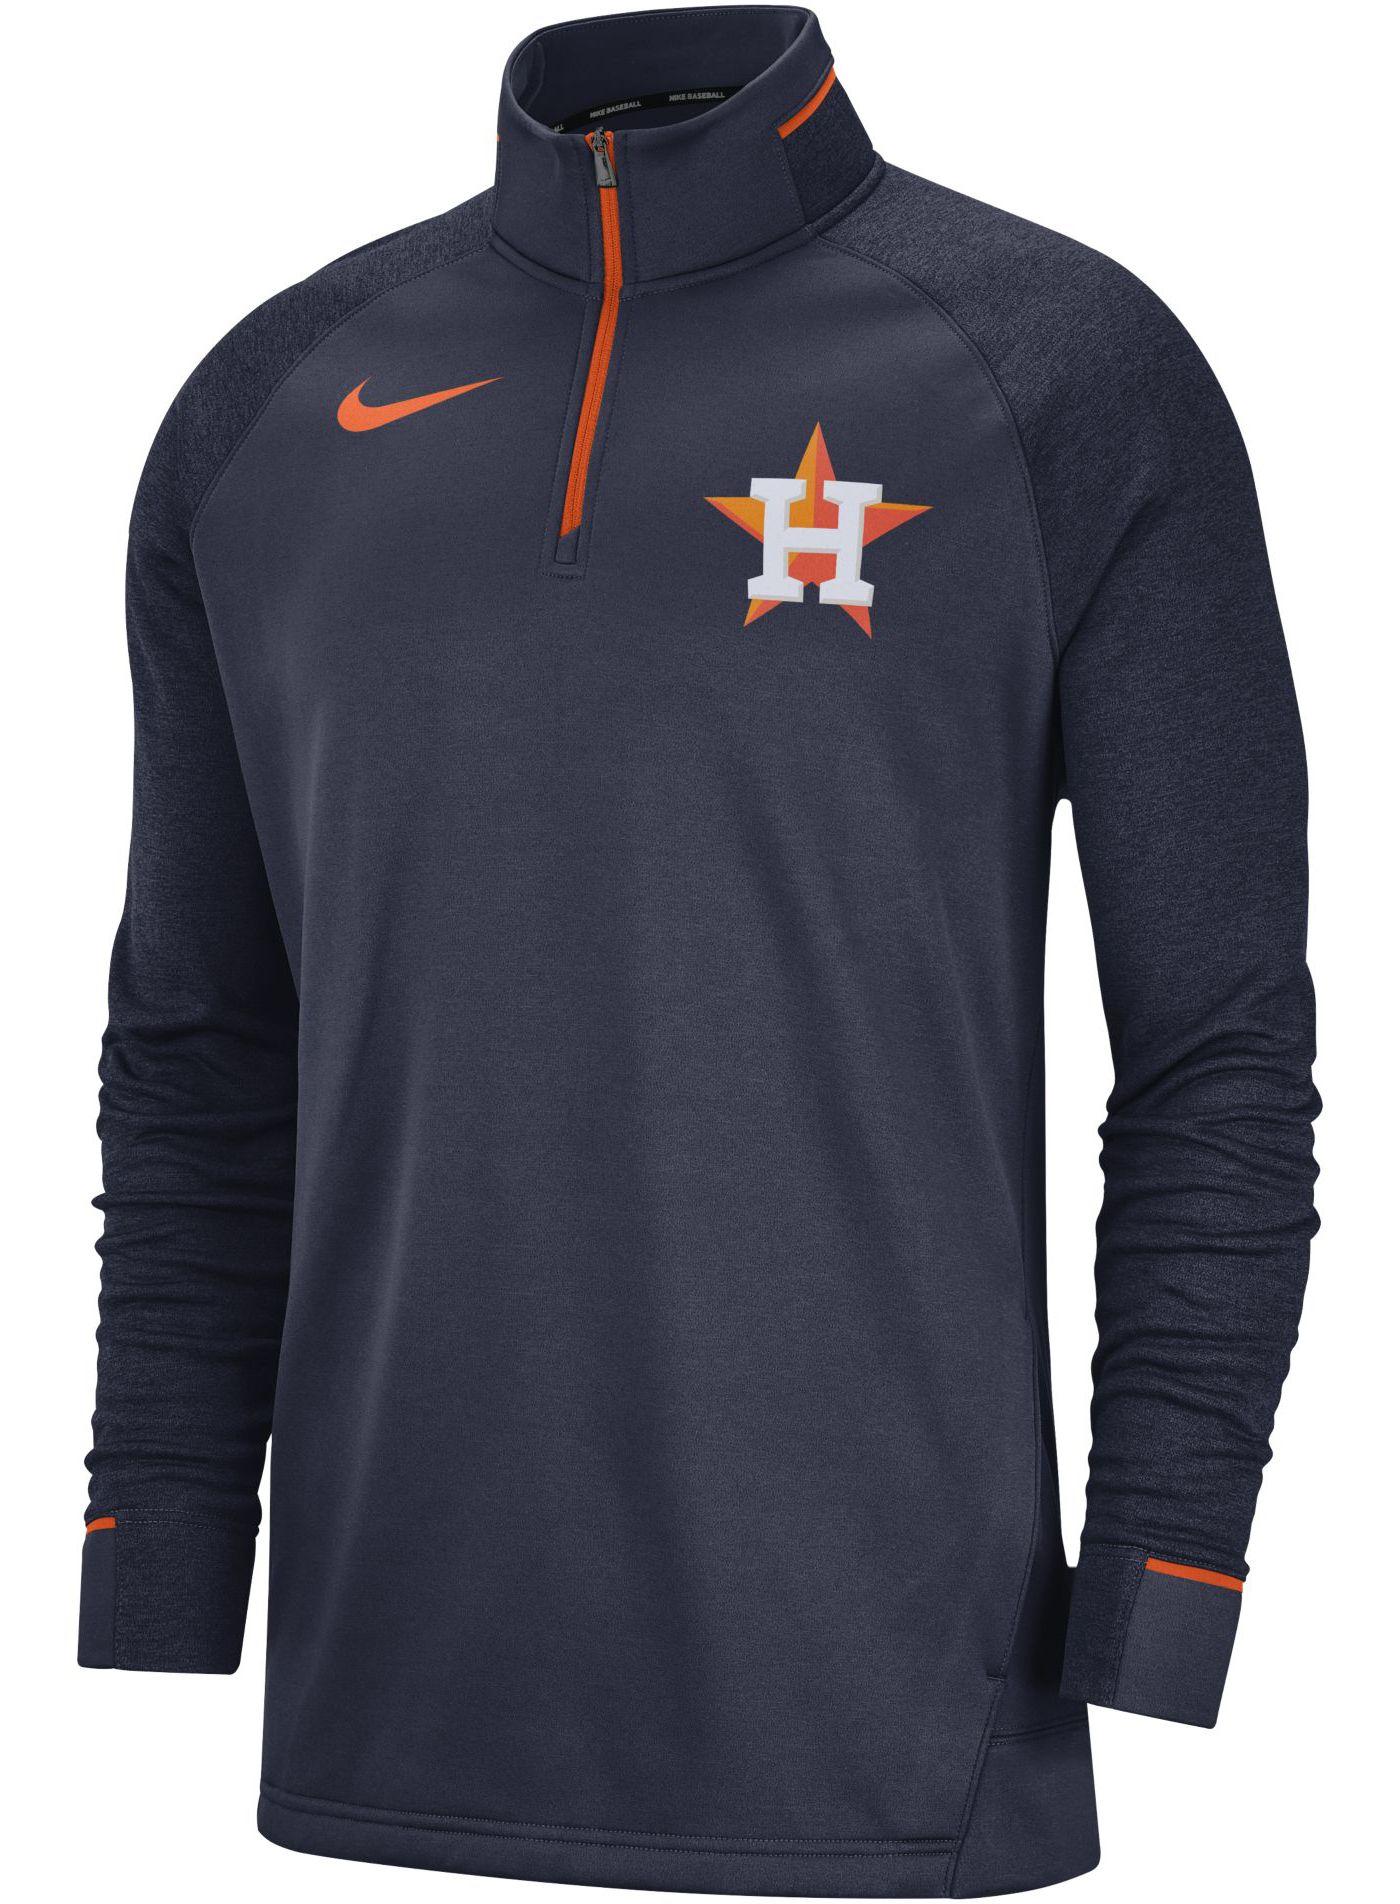 Nike Men's Houston Astros Dri-FIT Elite Half-Zip Pullover